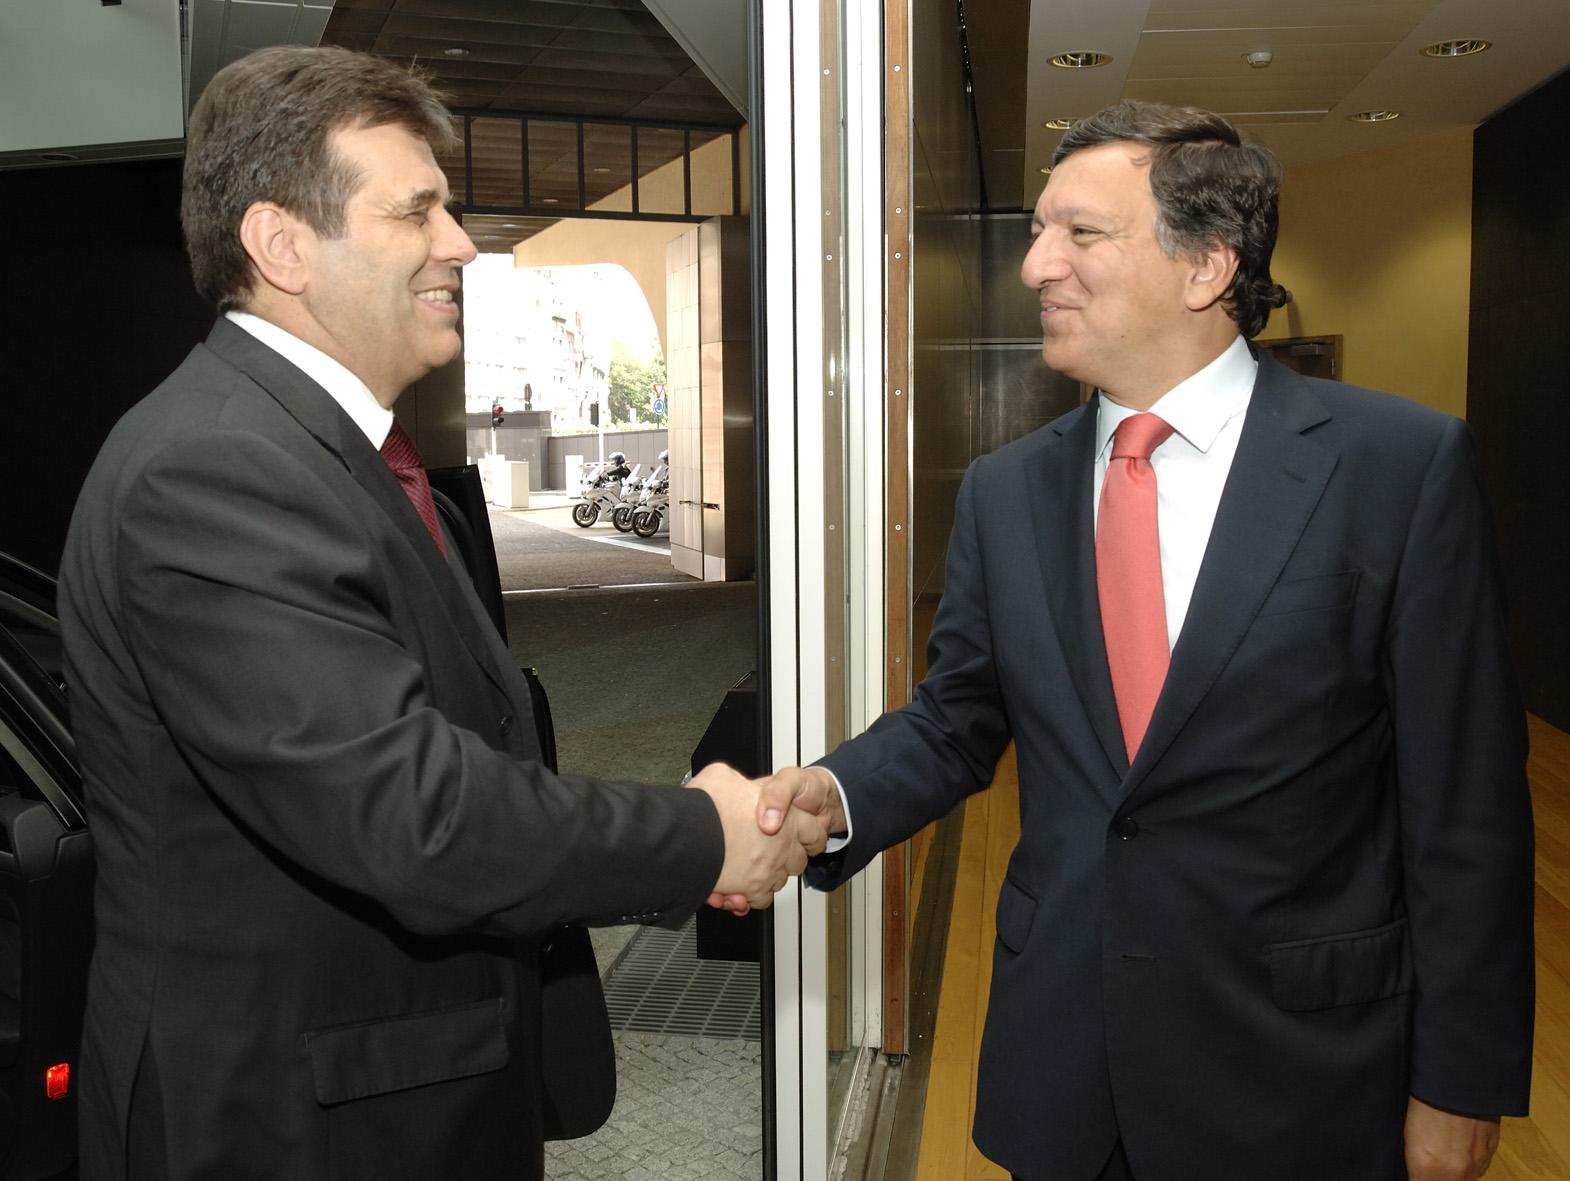 Visit by Vojislav Kostunica, Serbian Prime Minister, to the EC